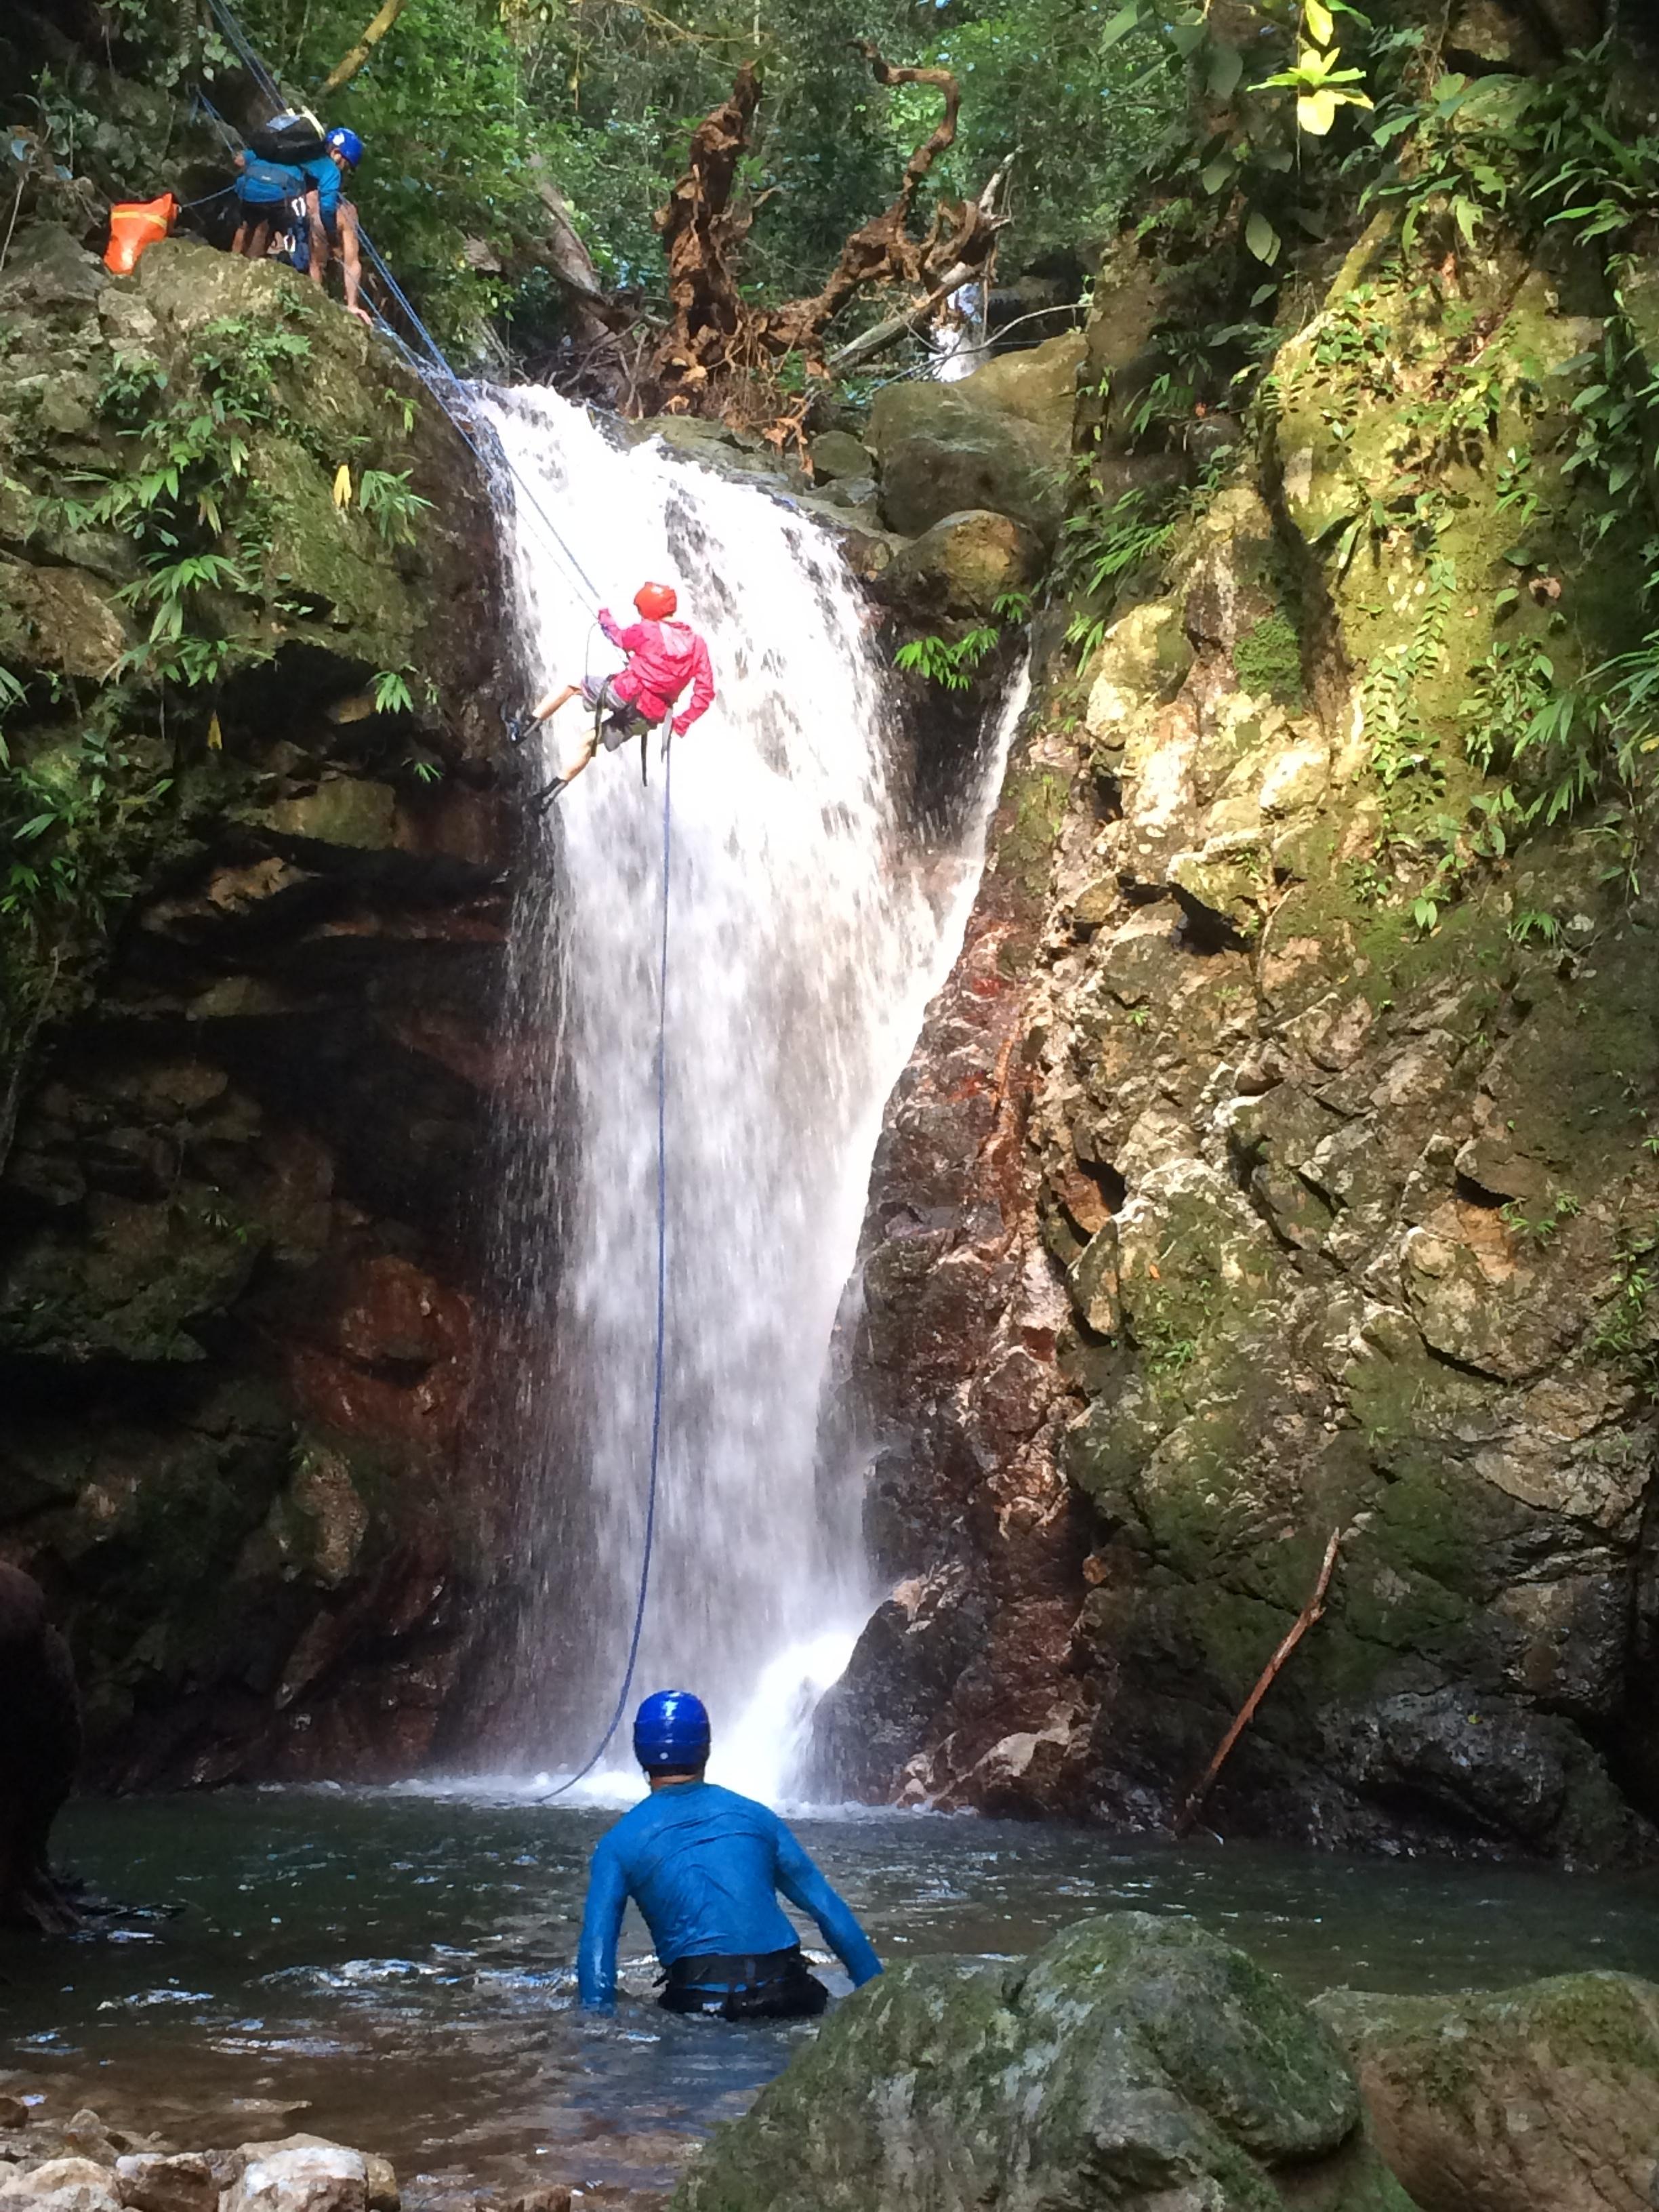 Felix gets steep and deep at 'Hidden Falls'